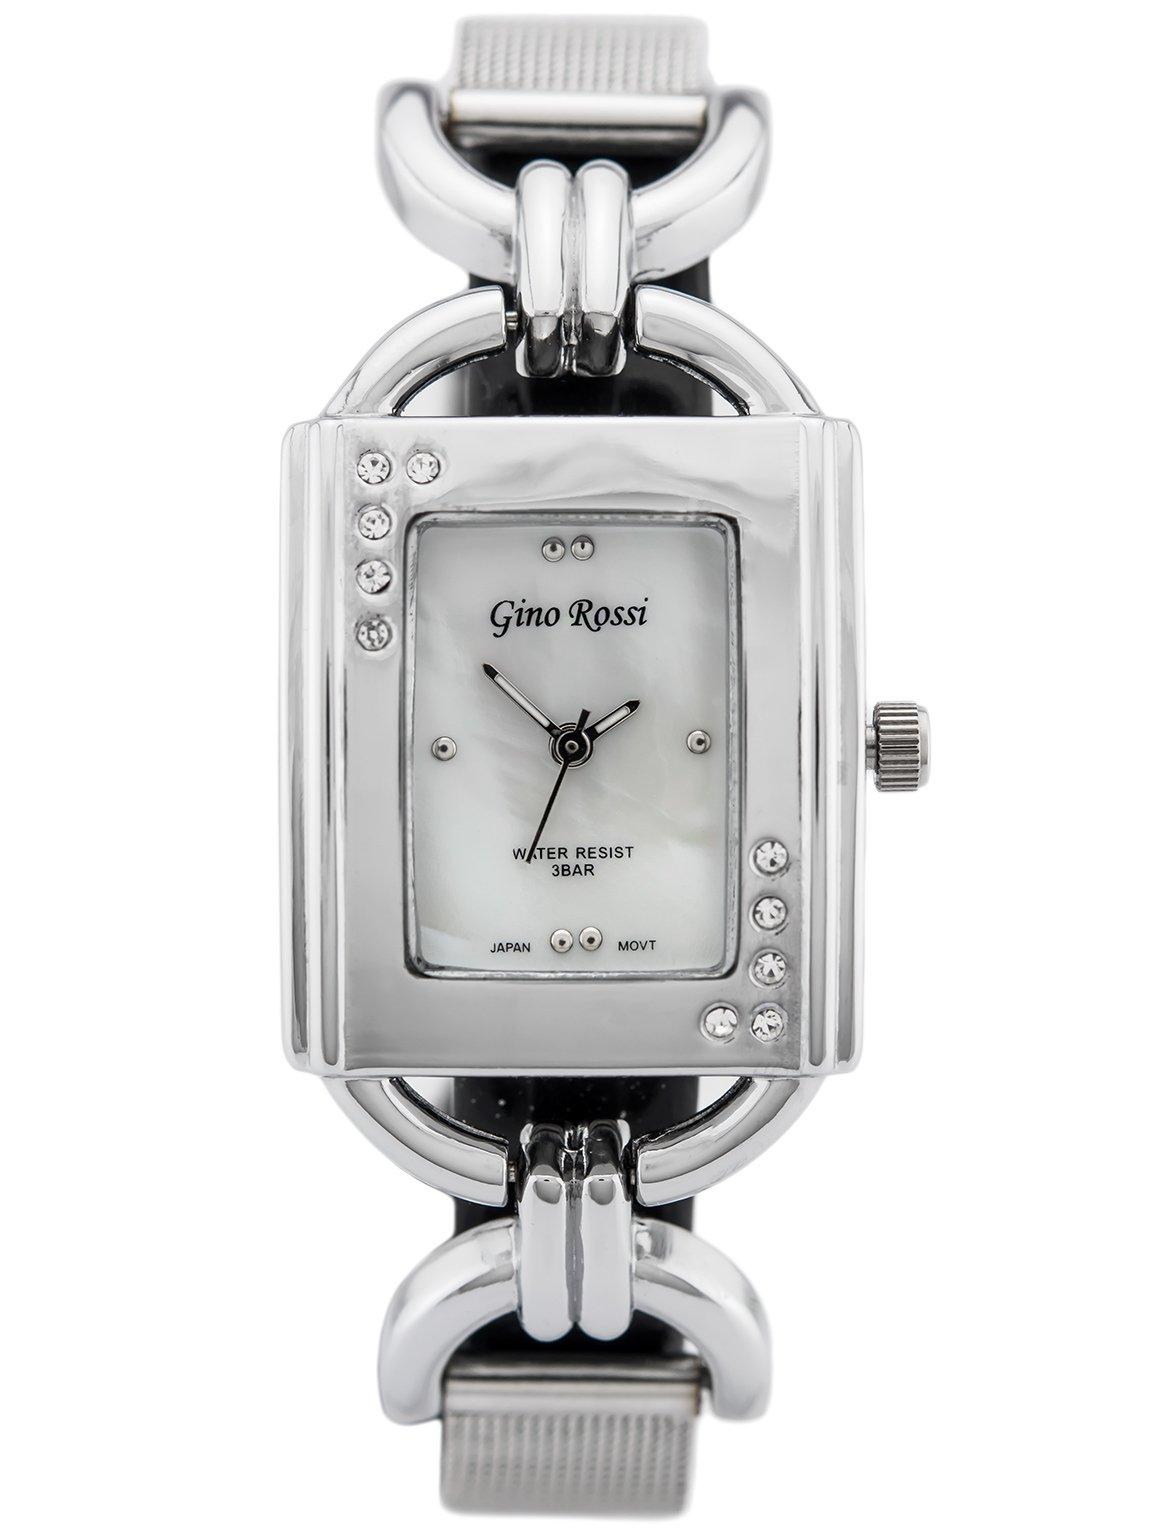 528face60a853 Zegarek damski GINO ROSSI 6659 6SS 89,00 zł cena tanio najtaniej ...